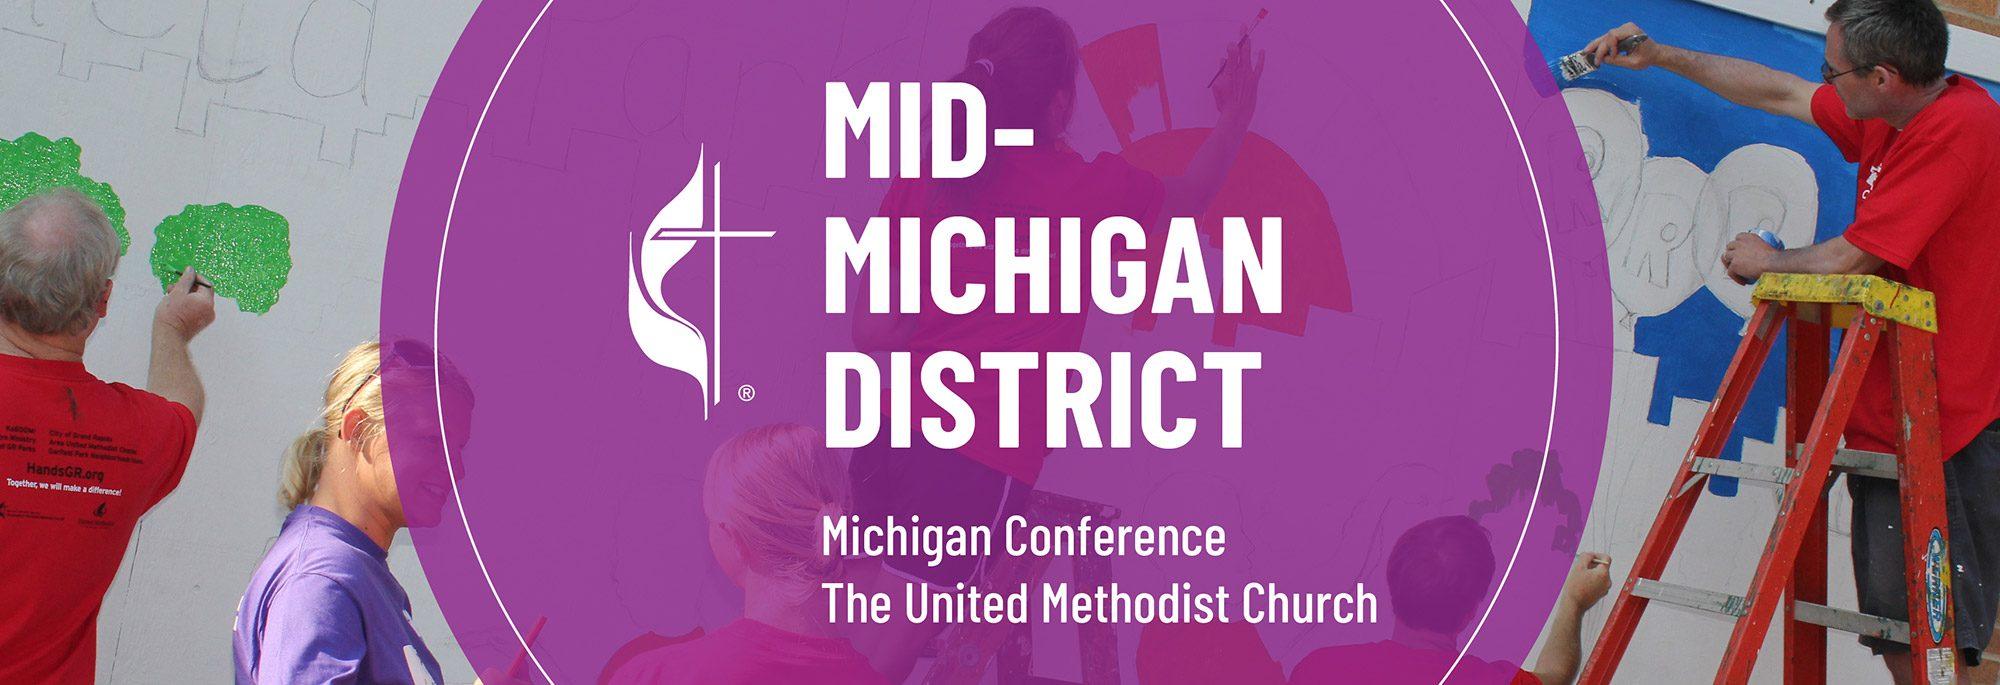 Mid-Michigan District Logo